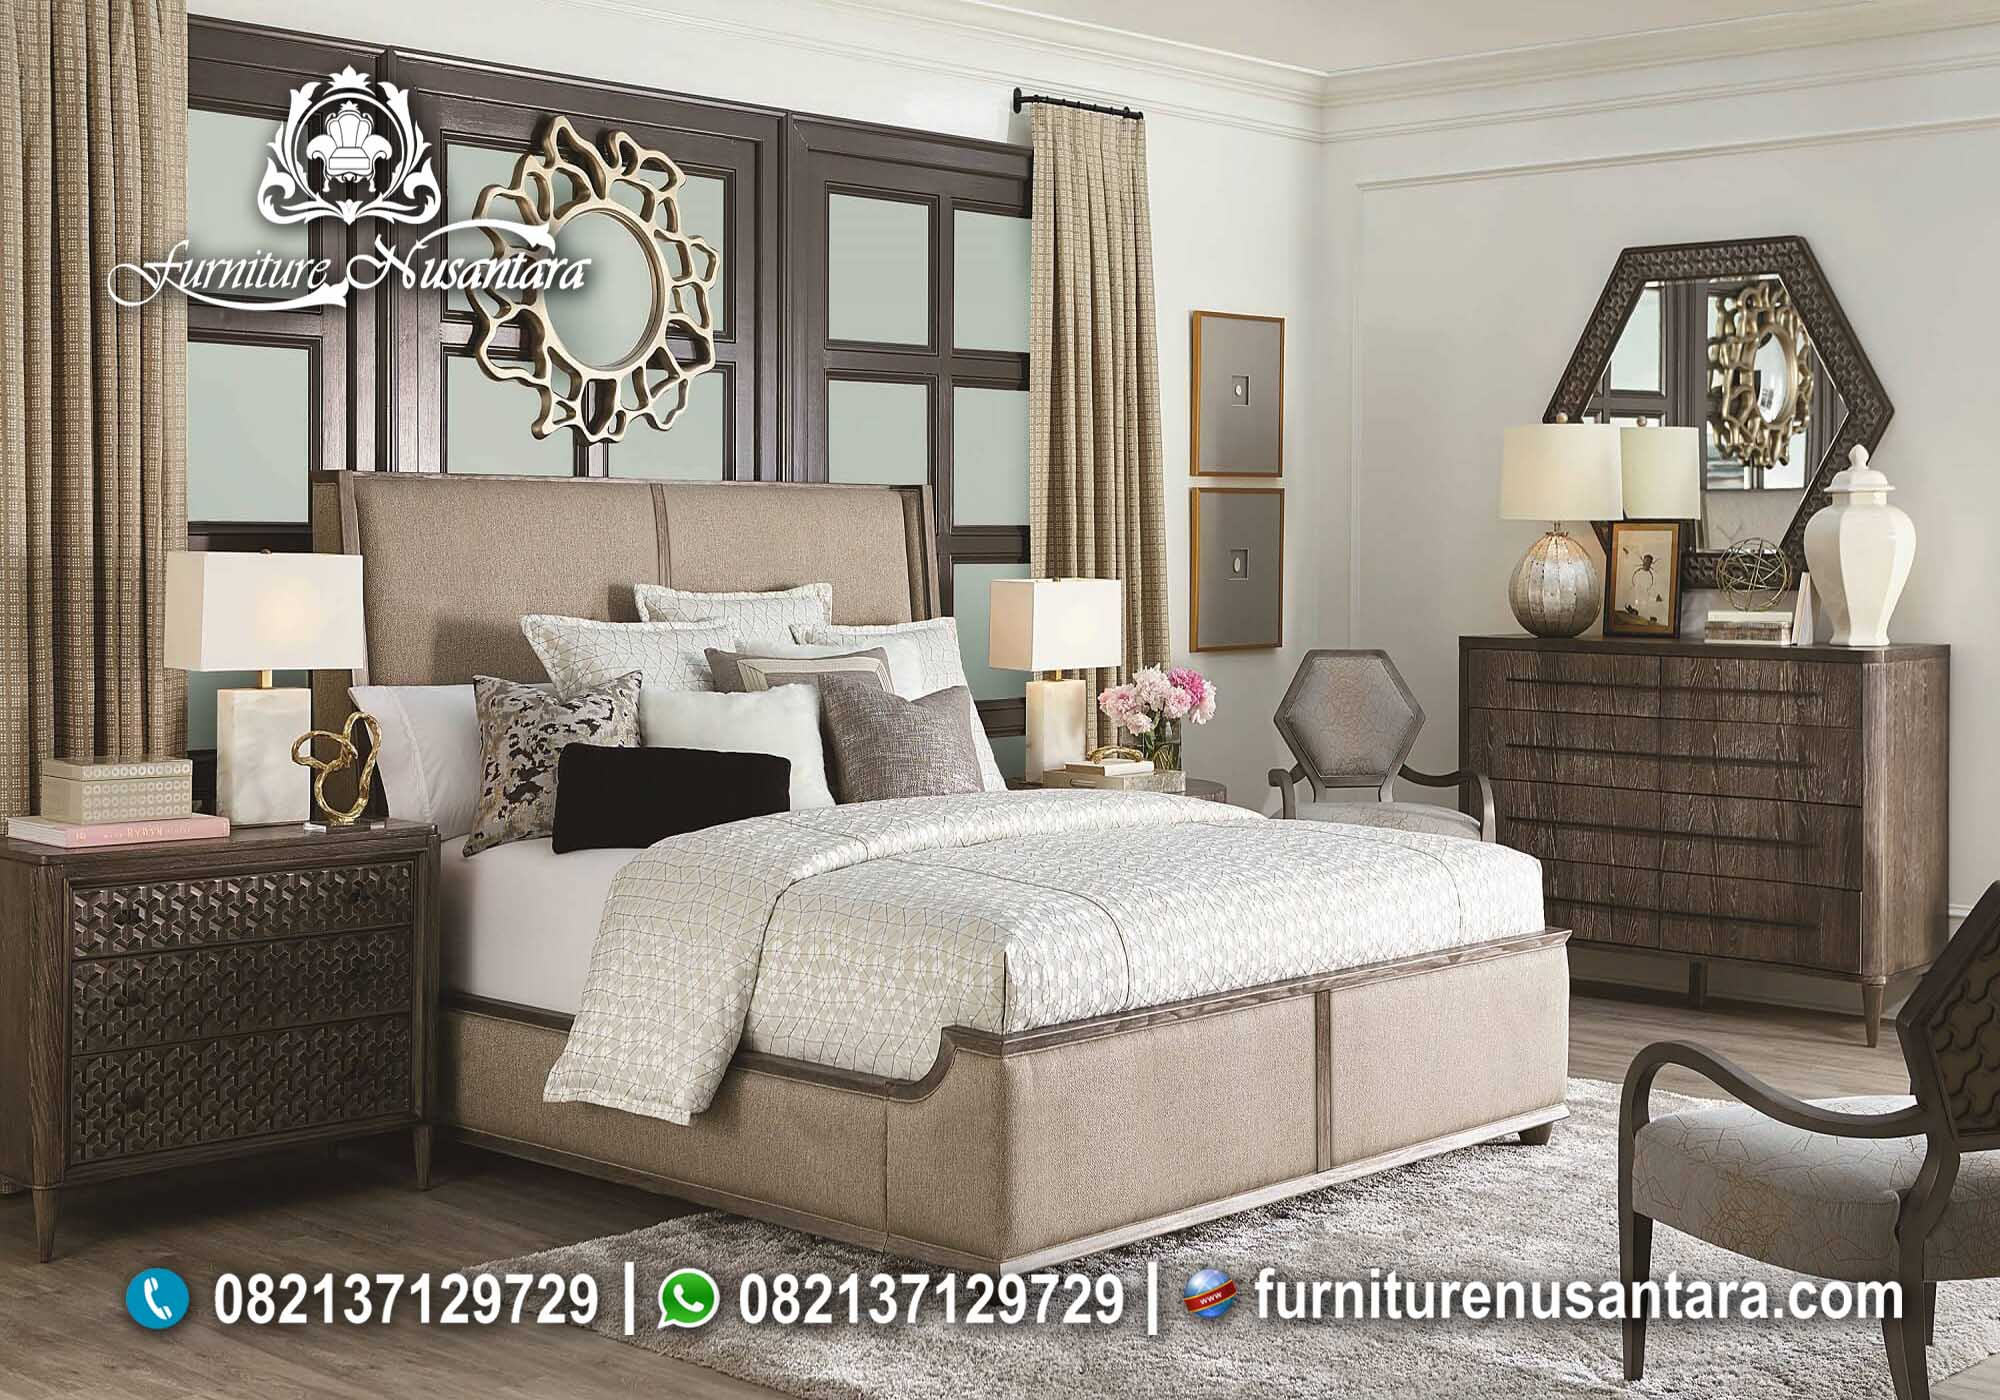 Jual Tempat Tidur Minimalis Murah KS-62, Furniture Nusantara